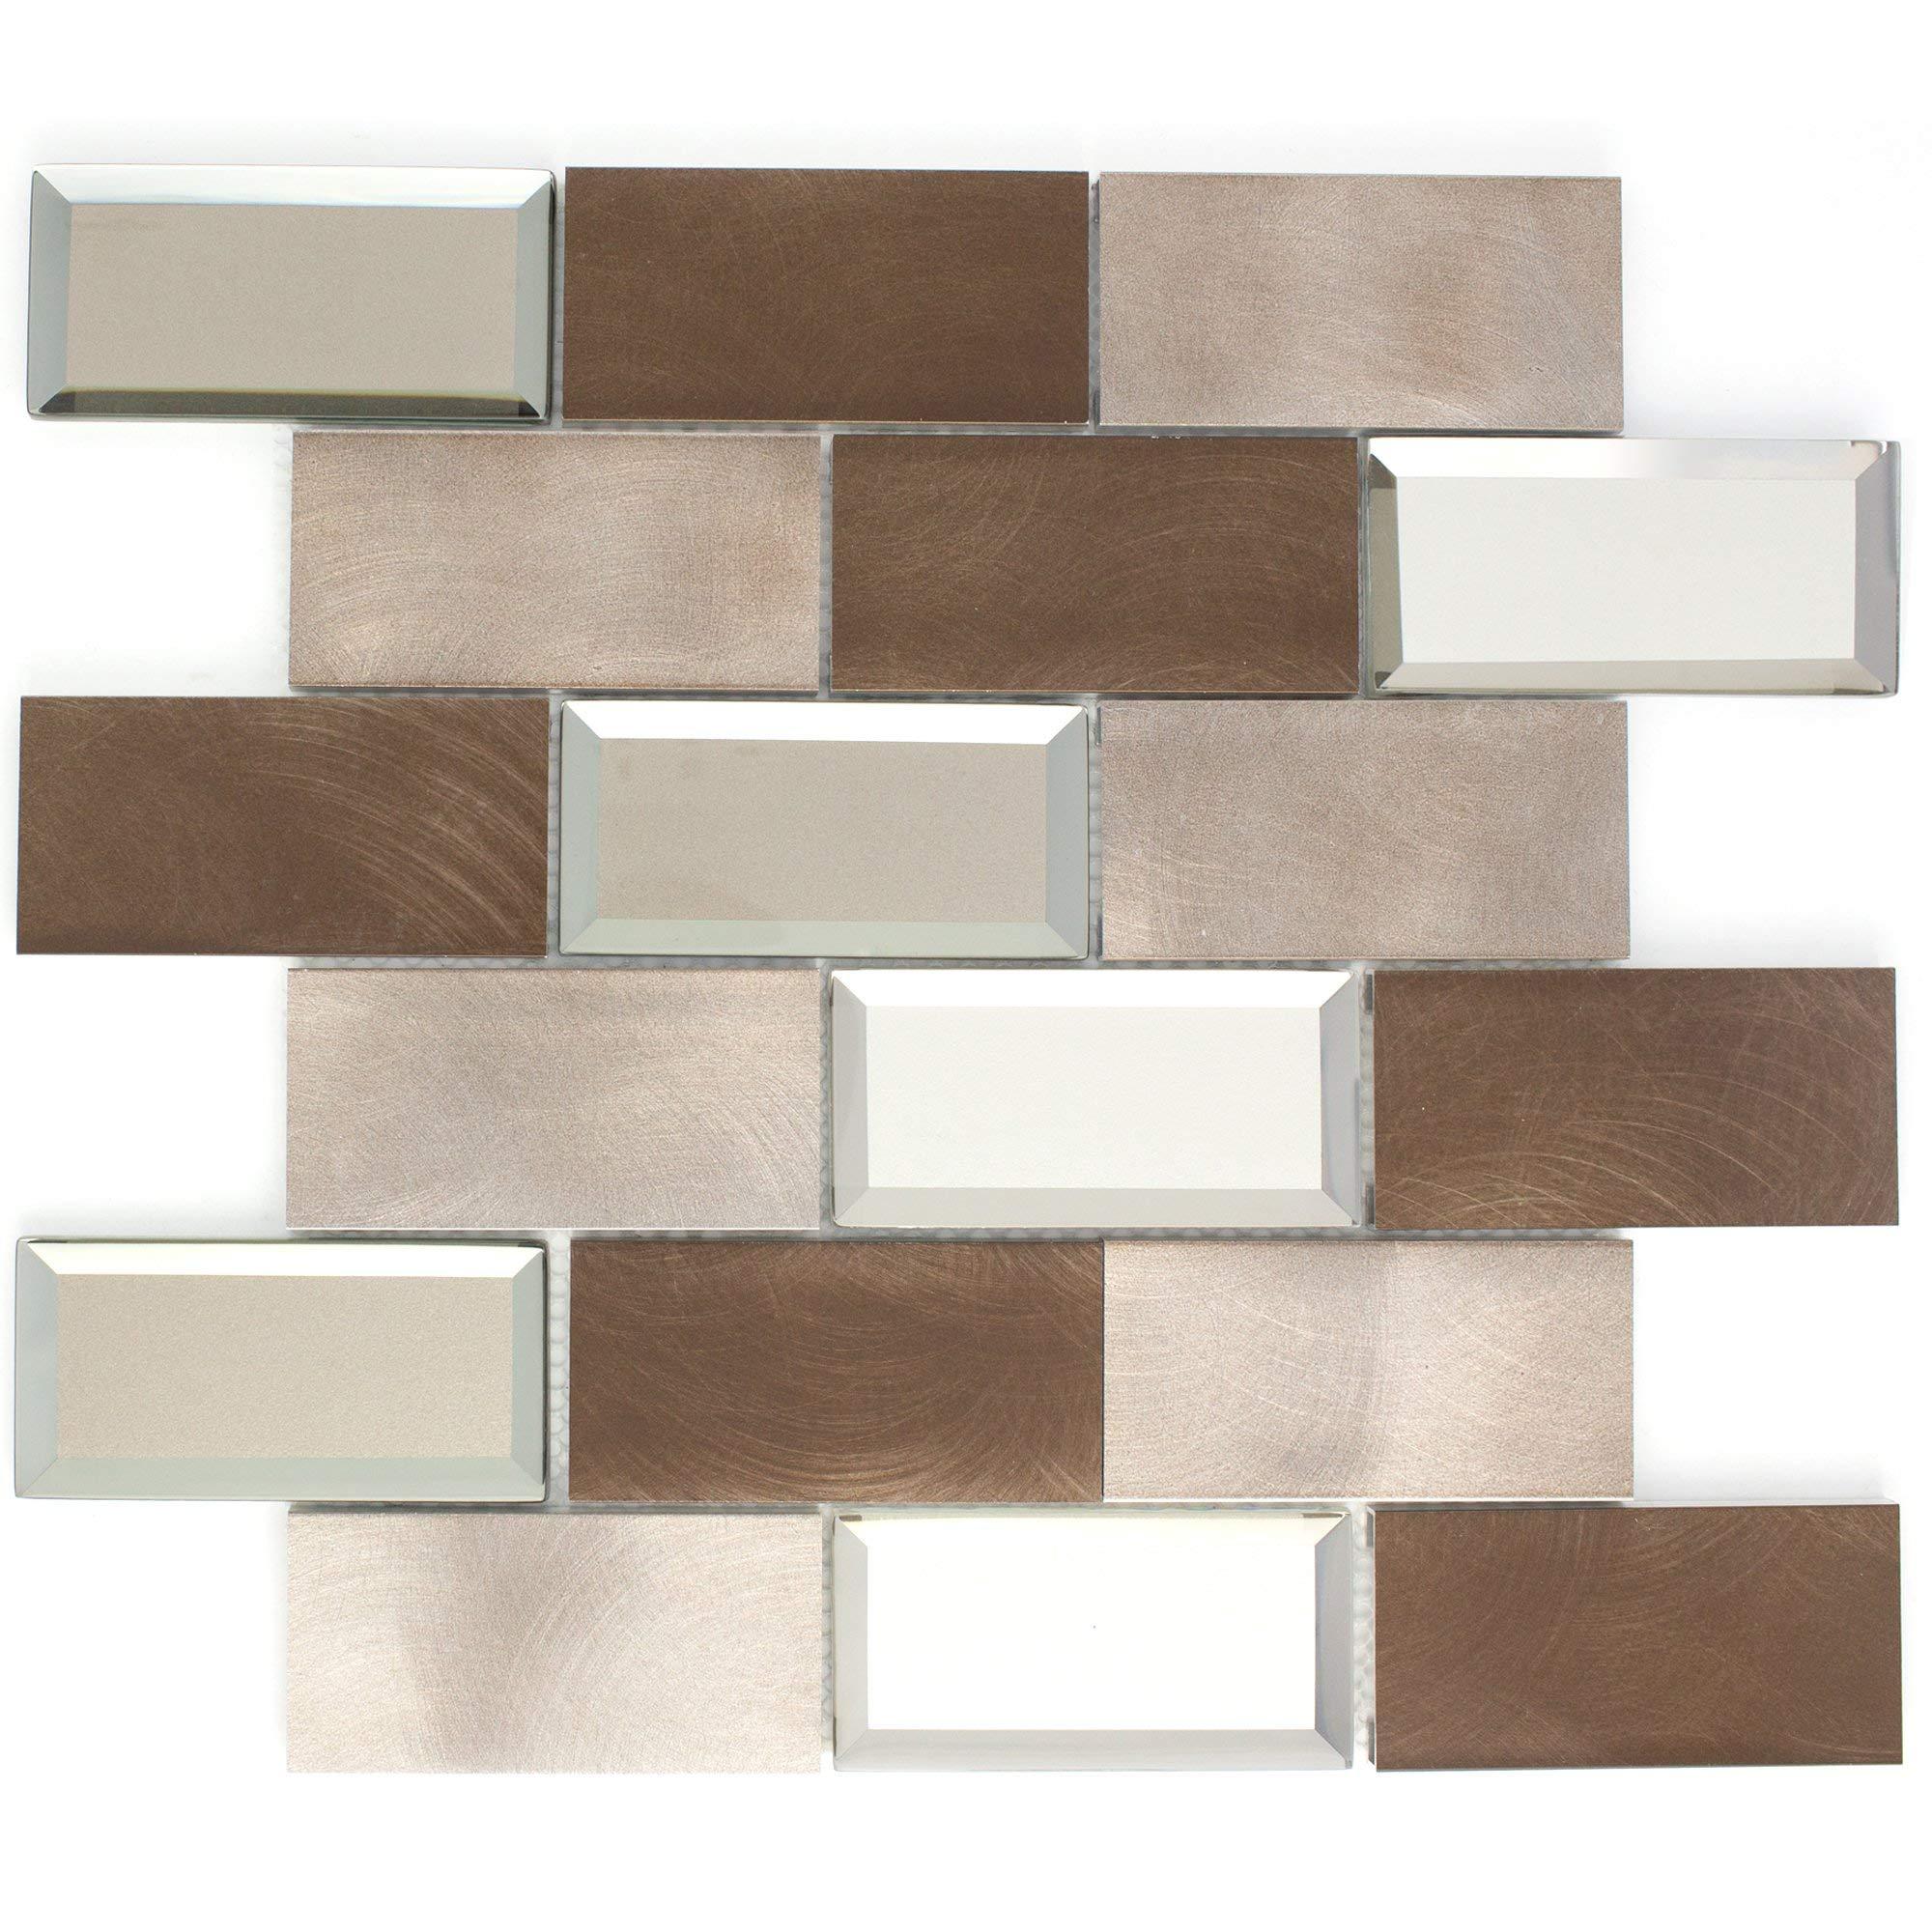 TAFMG-01 2x4 Subway Tile Bronze Almiunum Mix Mirror Glass Mosaic Tile-Kitchen and Bath backsplash Wall Tile